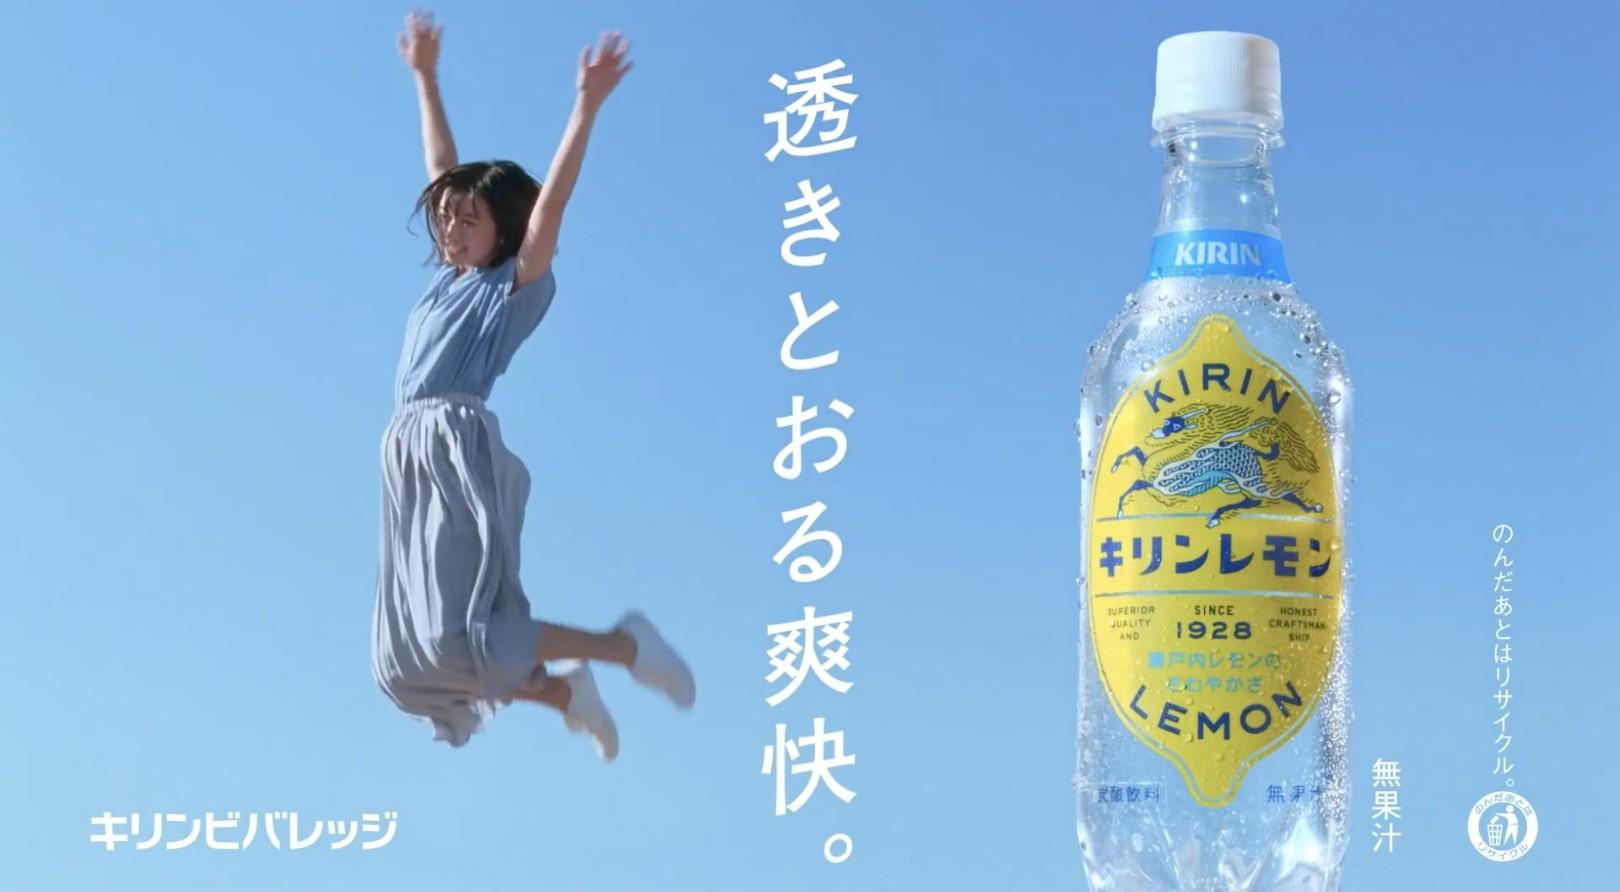 Cm キリン 歌詞 レモン